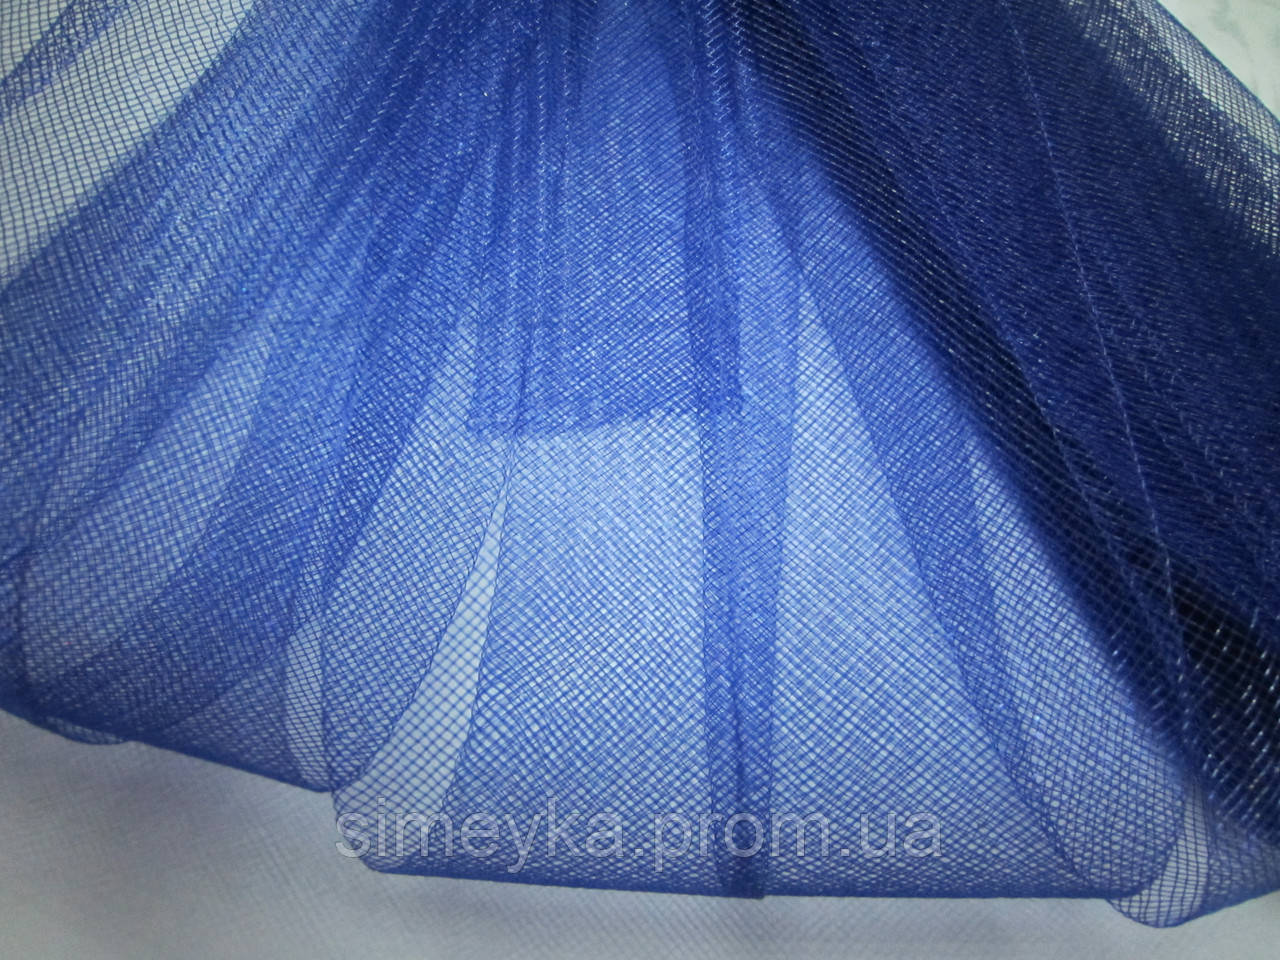 Регилин мягкий (кренолин) плоский 5 см тёмно-синий